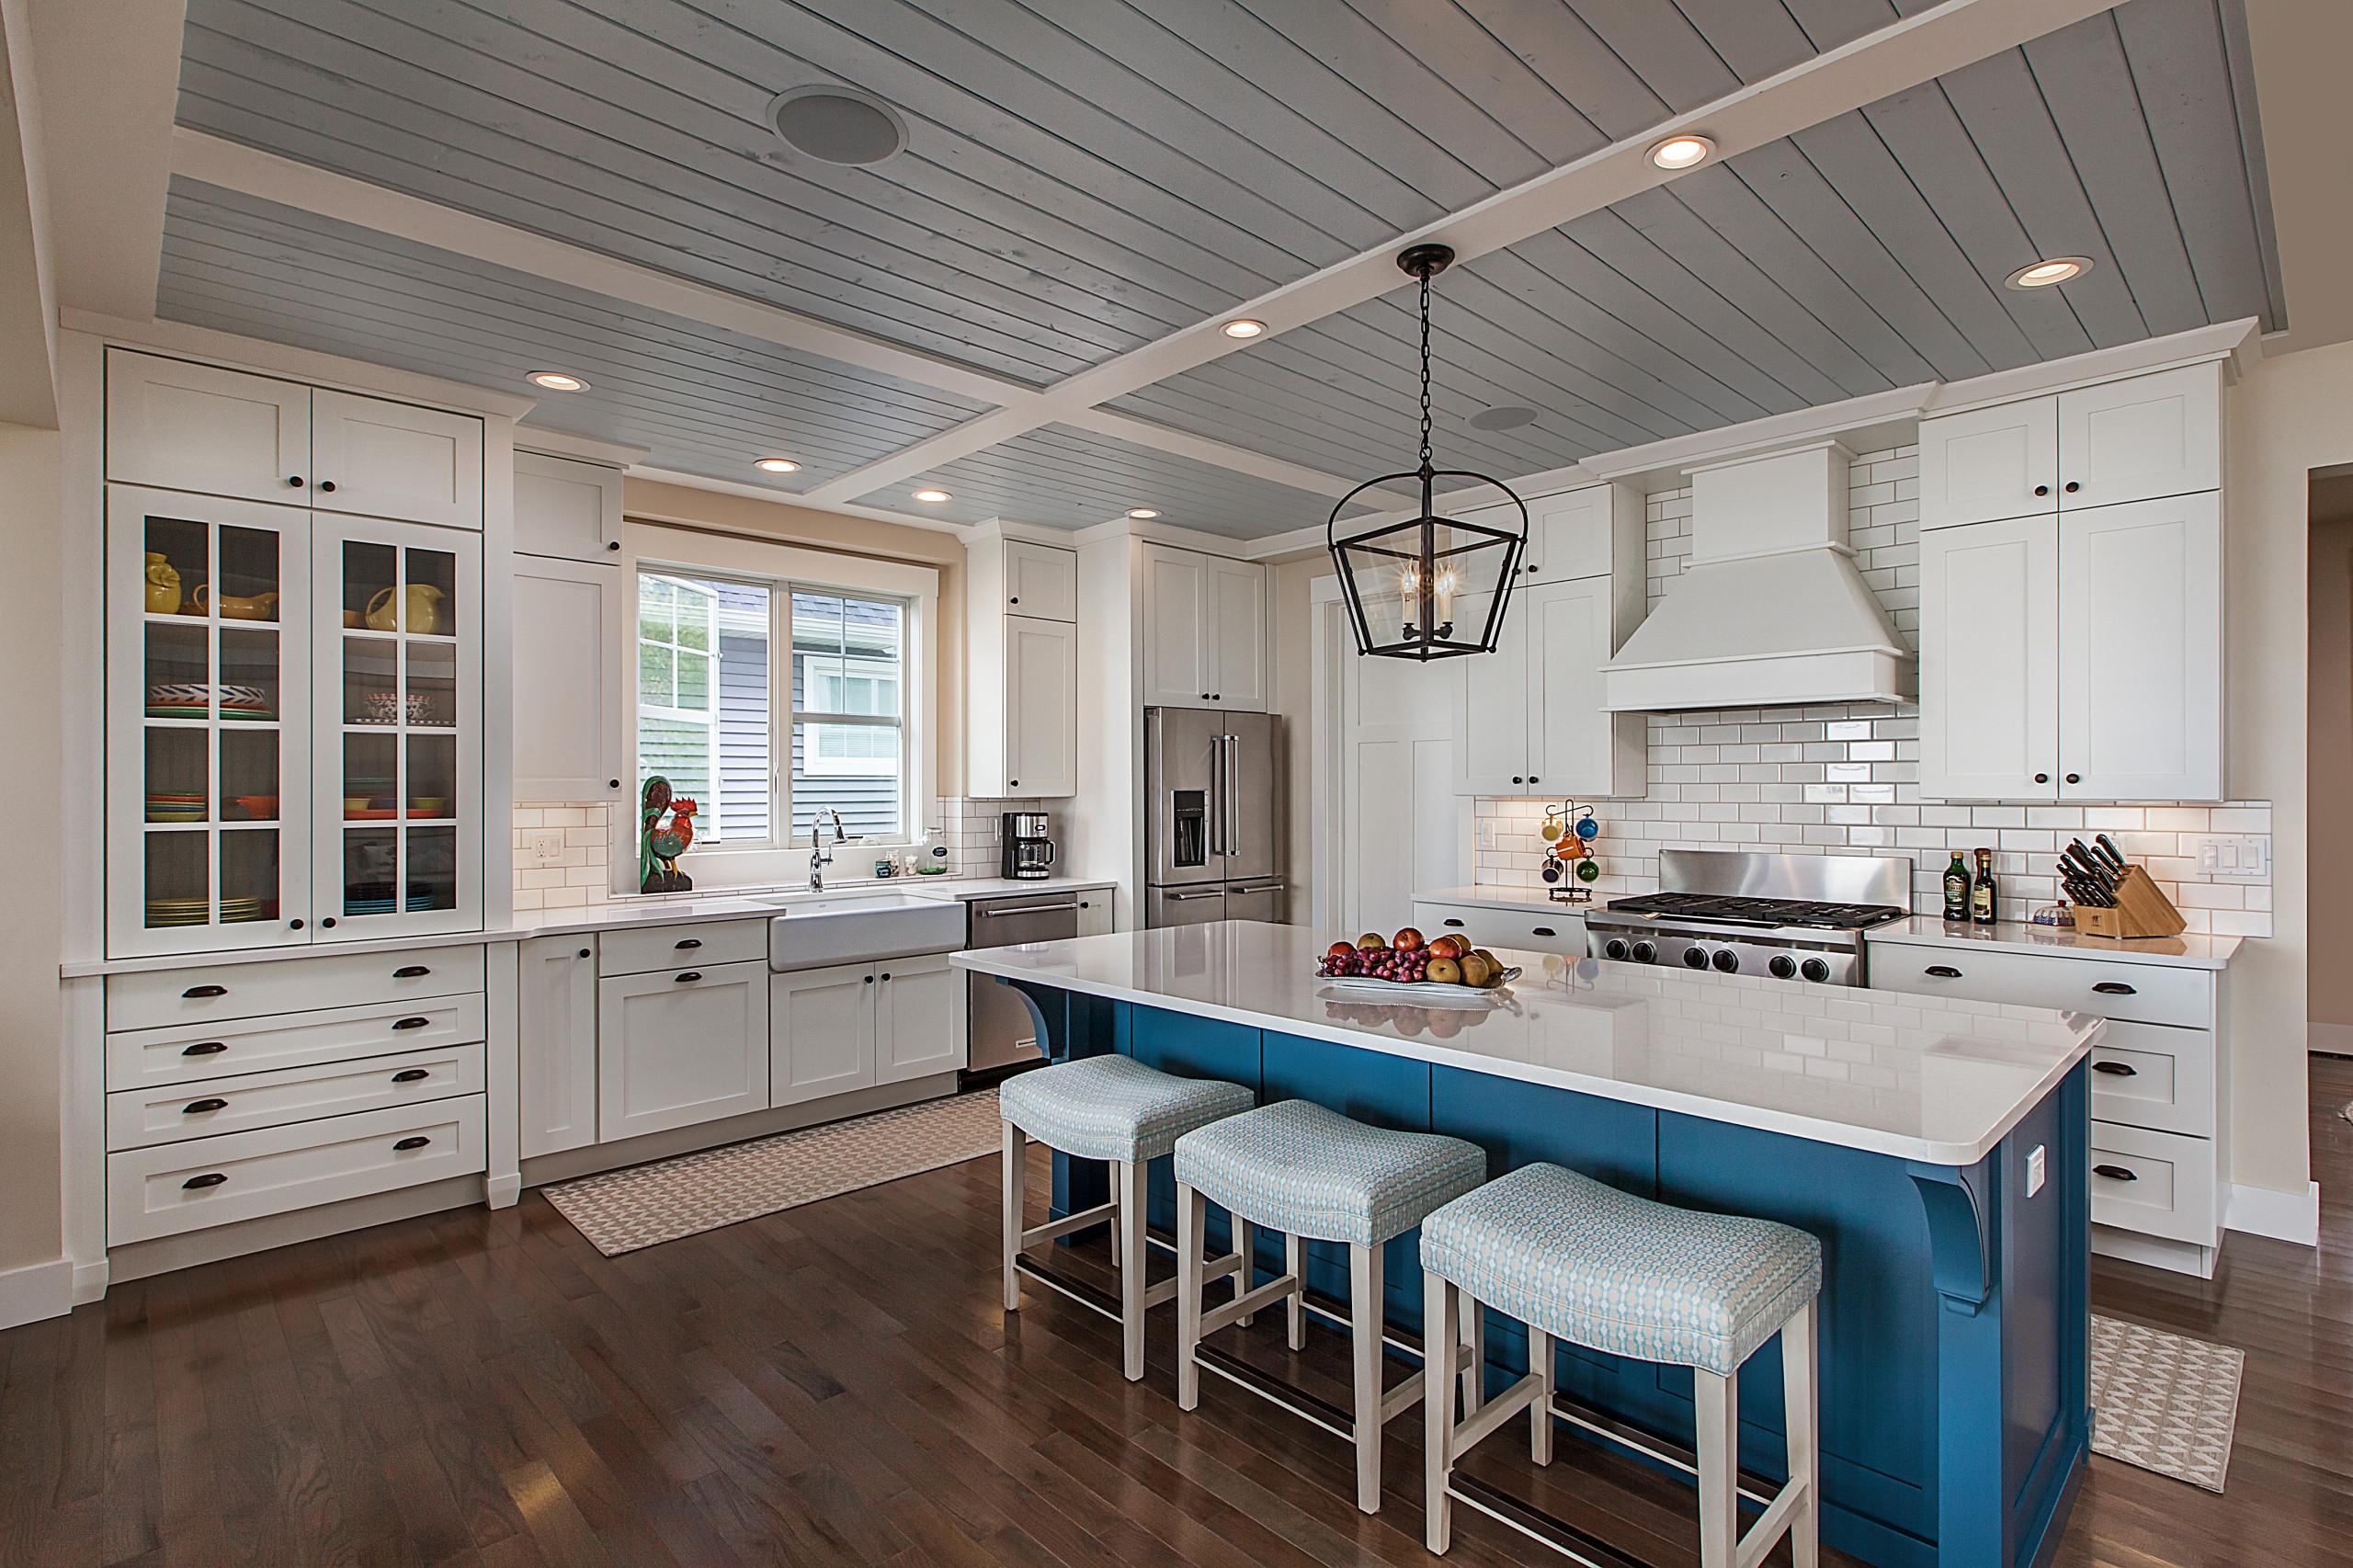 75 Beautiful Shiplap Ceiling Kitchen Pictures Ideas April 2021 Houzz